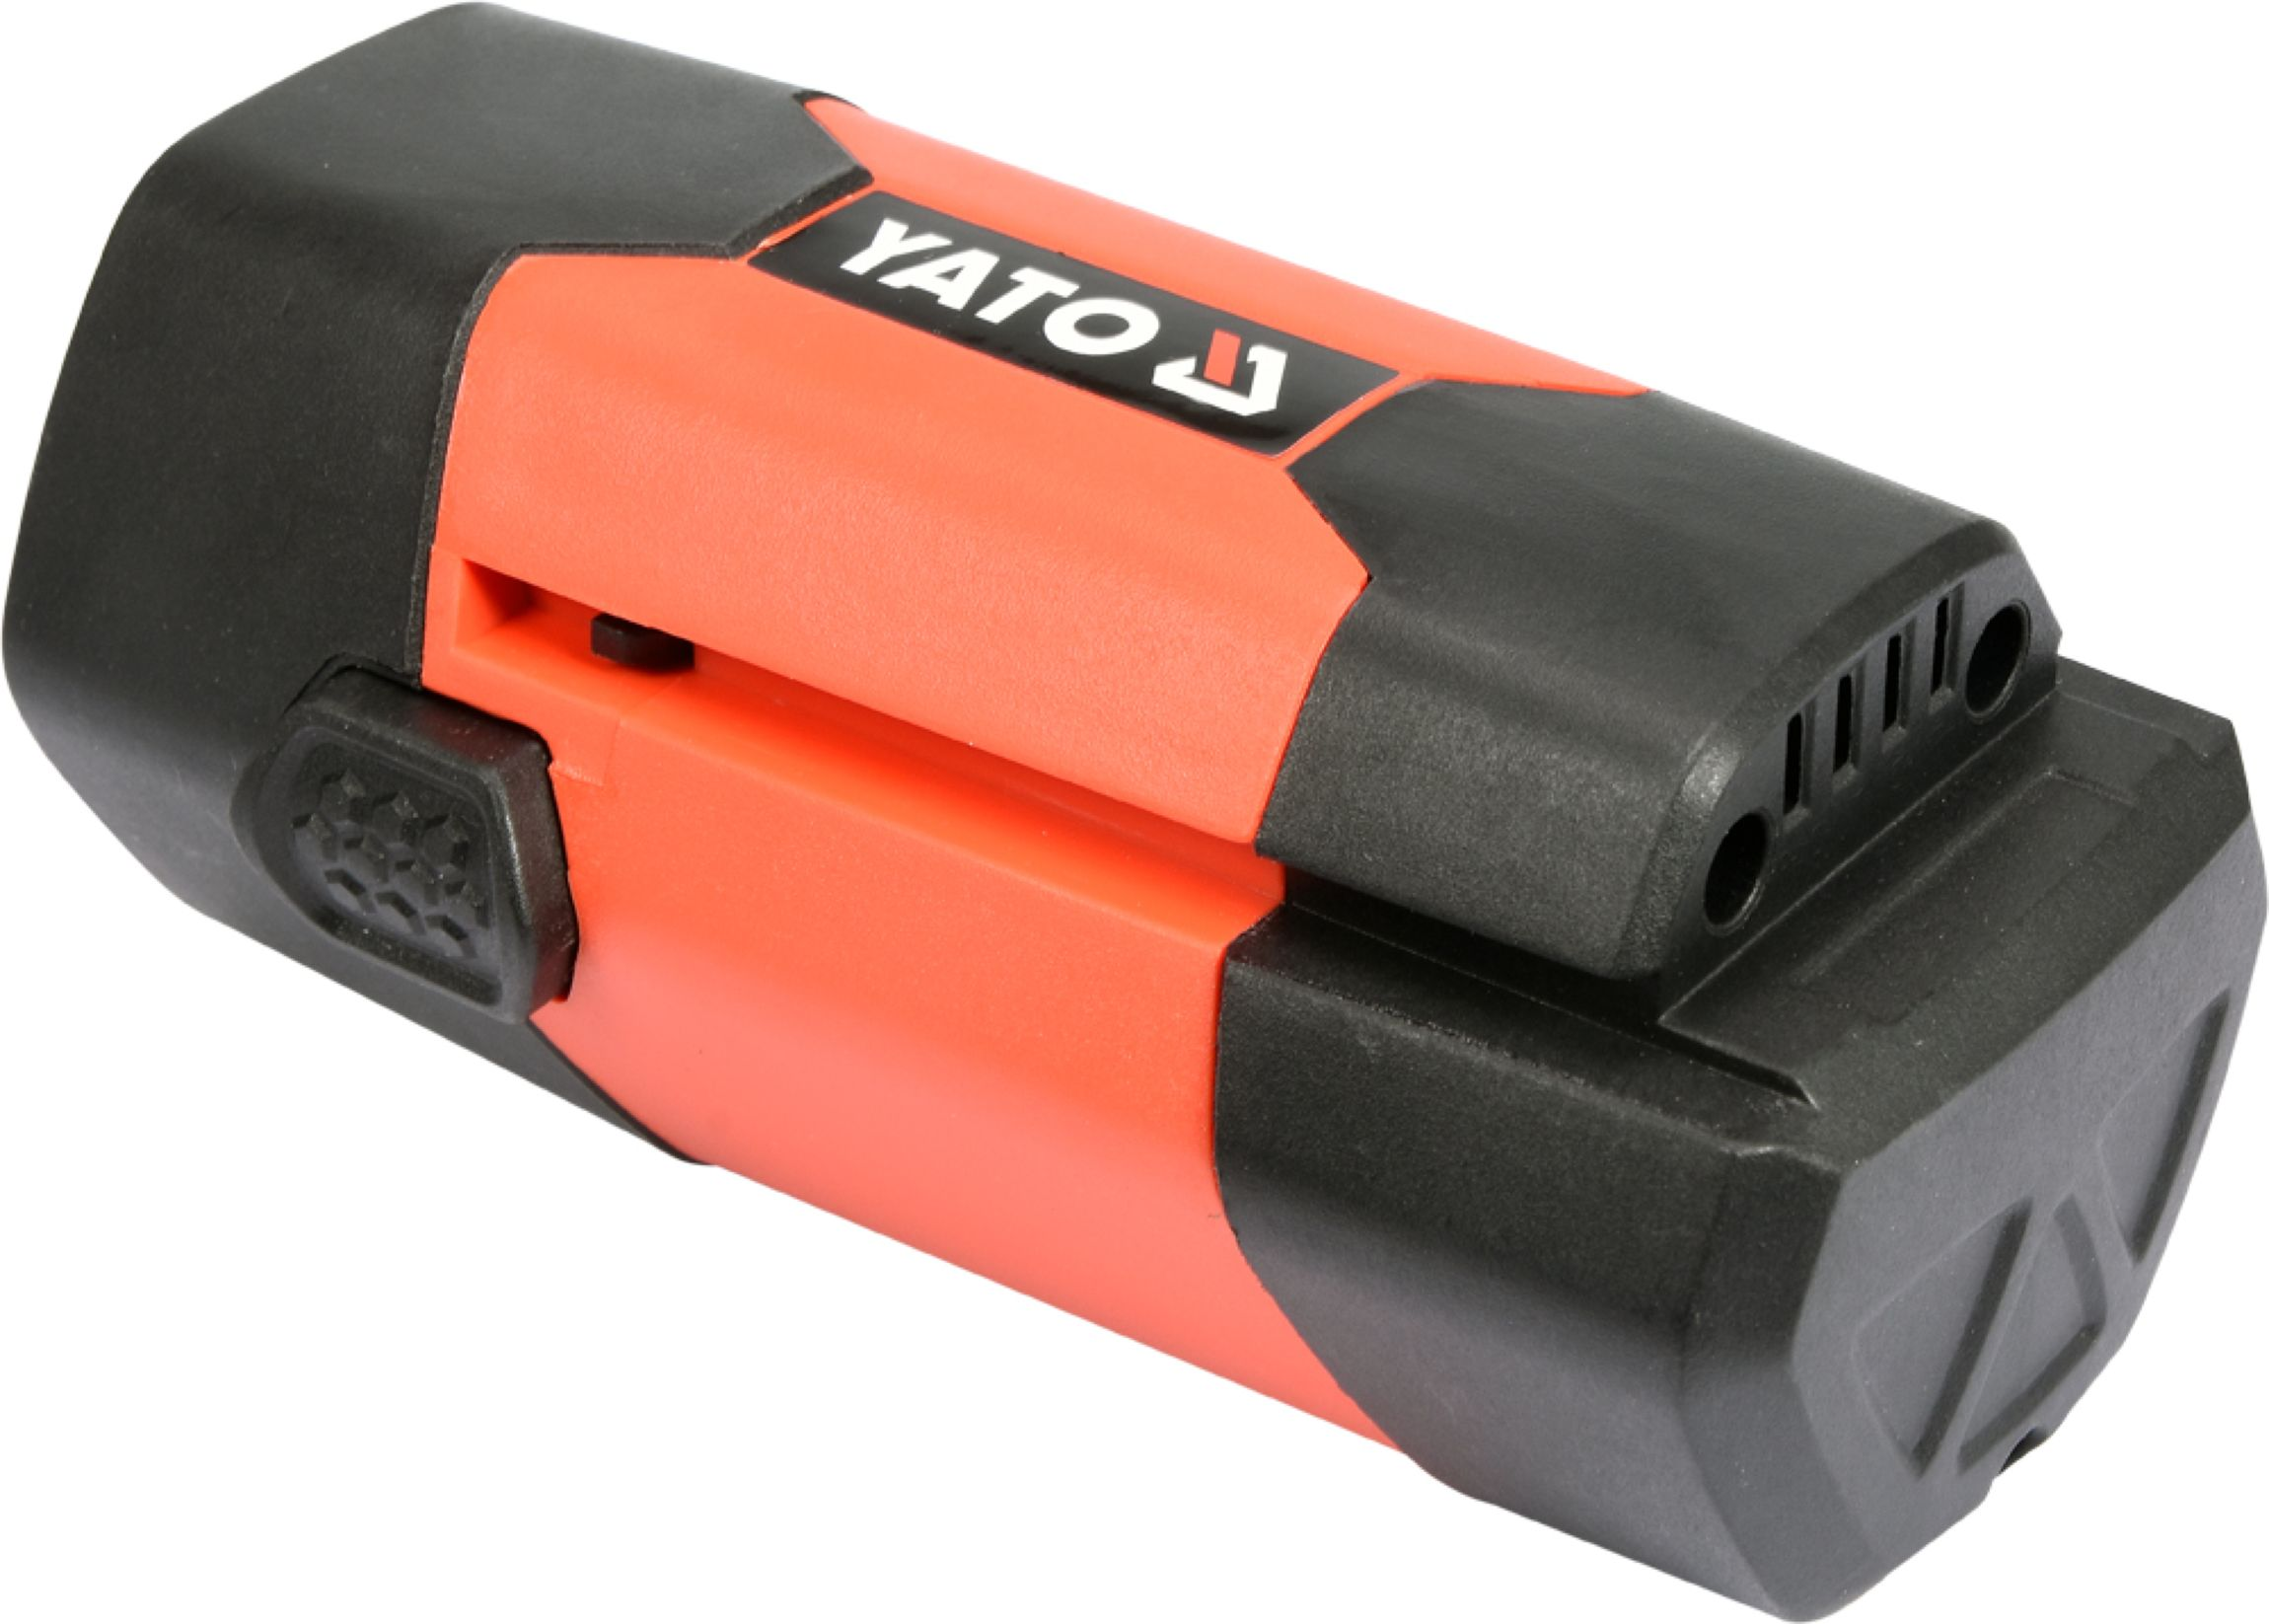 Baterie náhradní 18V Li-ion 3,0 AH (YT-85110, YT-85120)